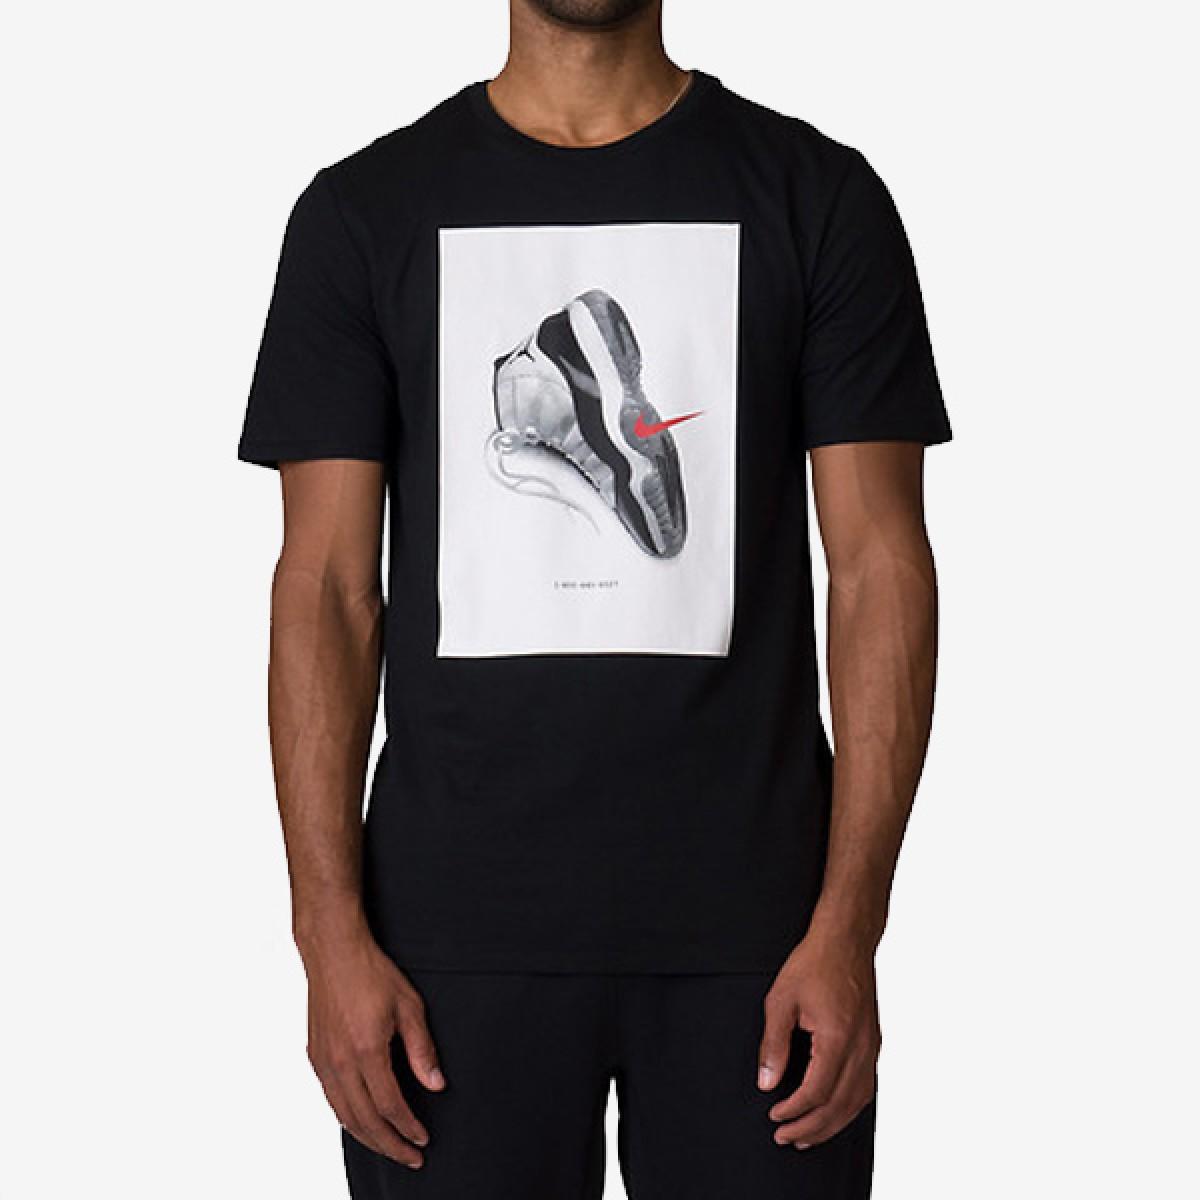 Jordan AJ11 Concord T-Shirt 'Black'